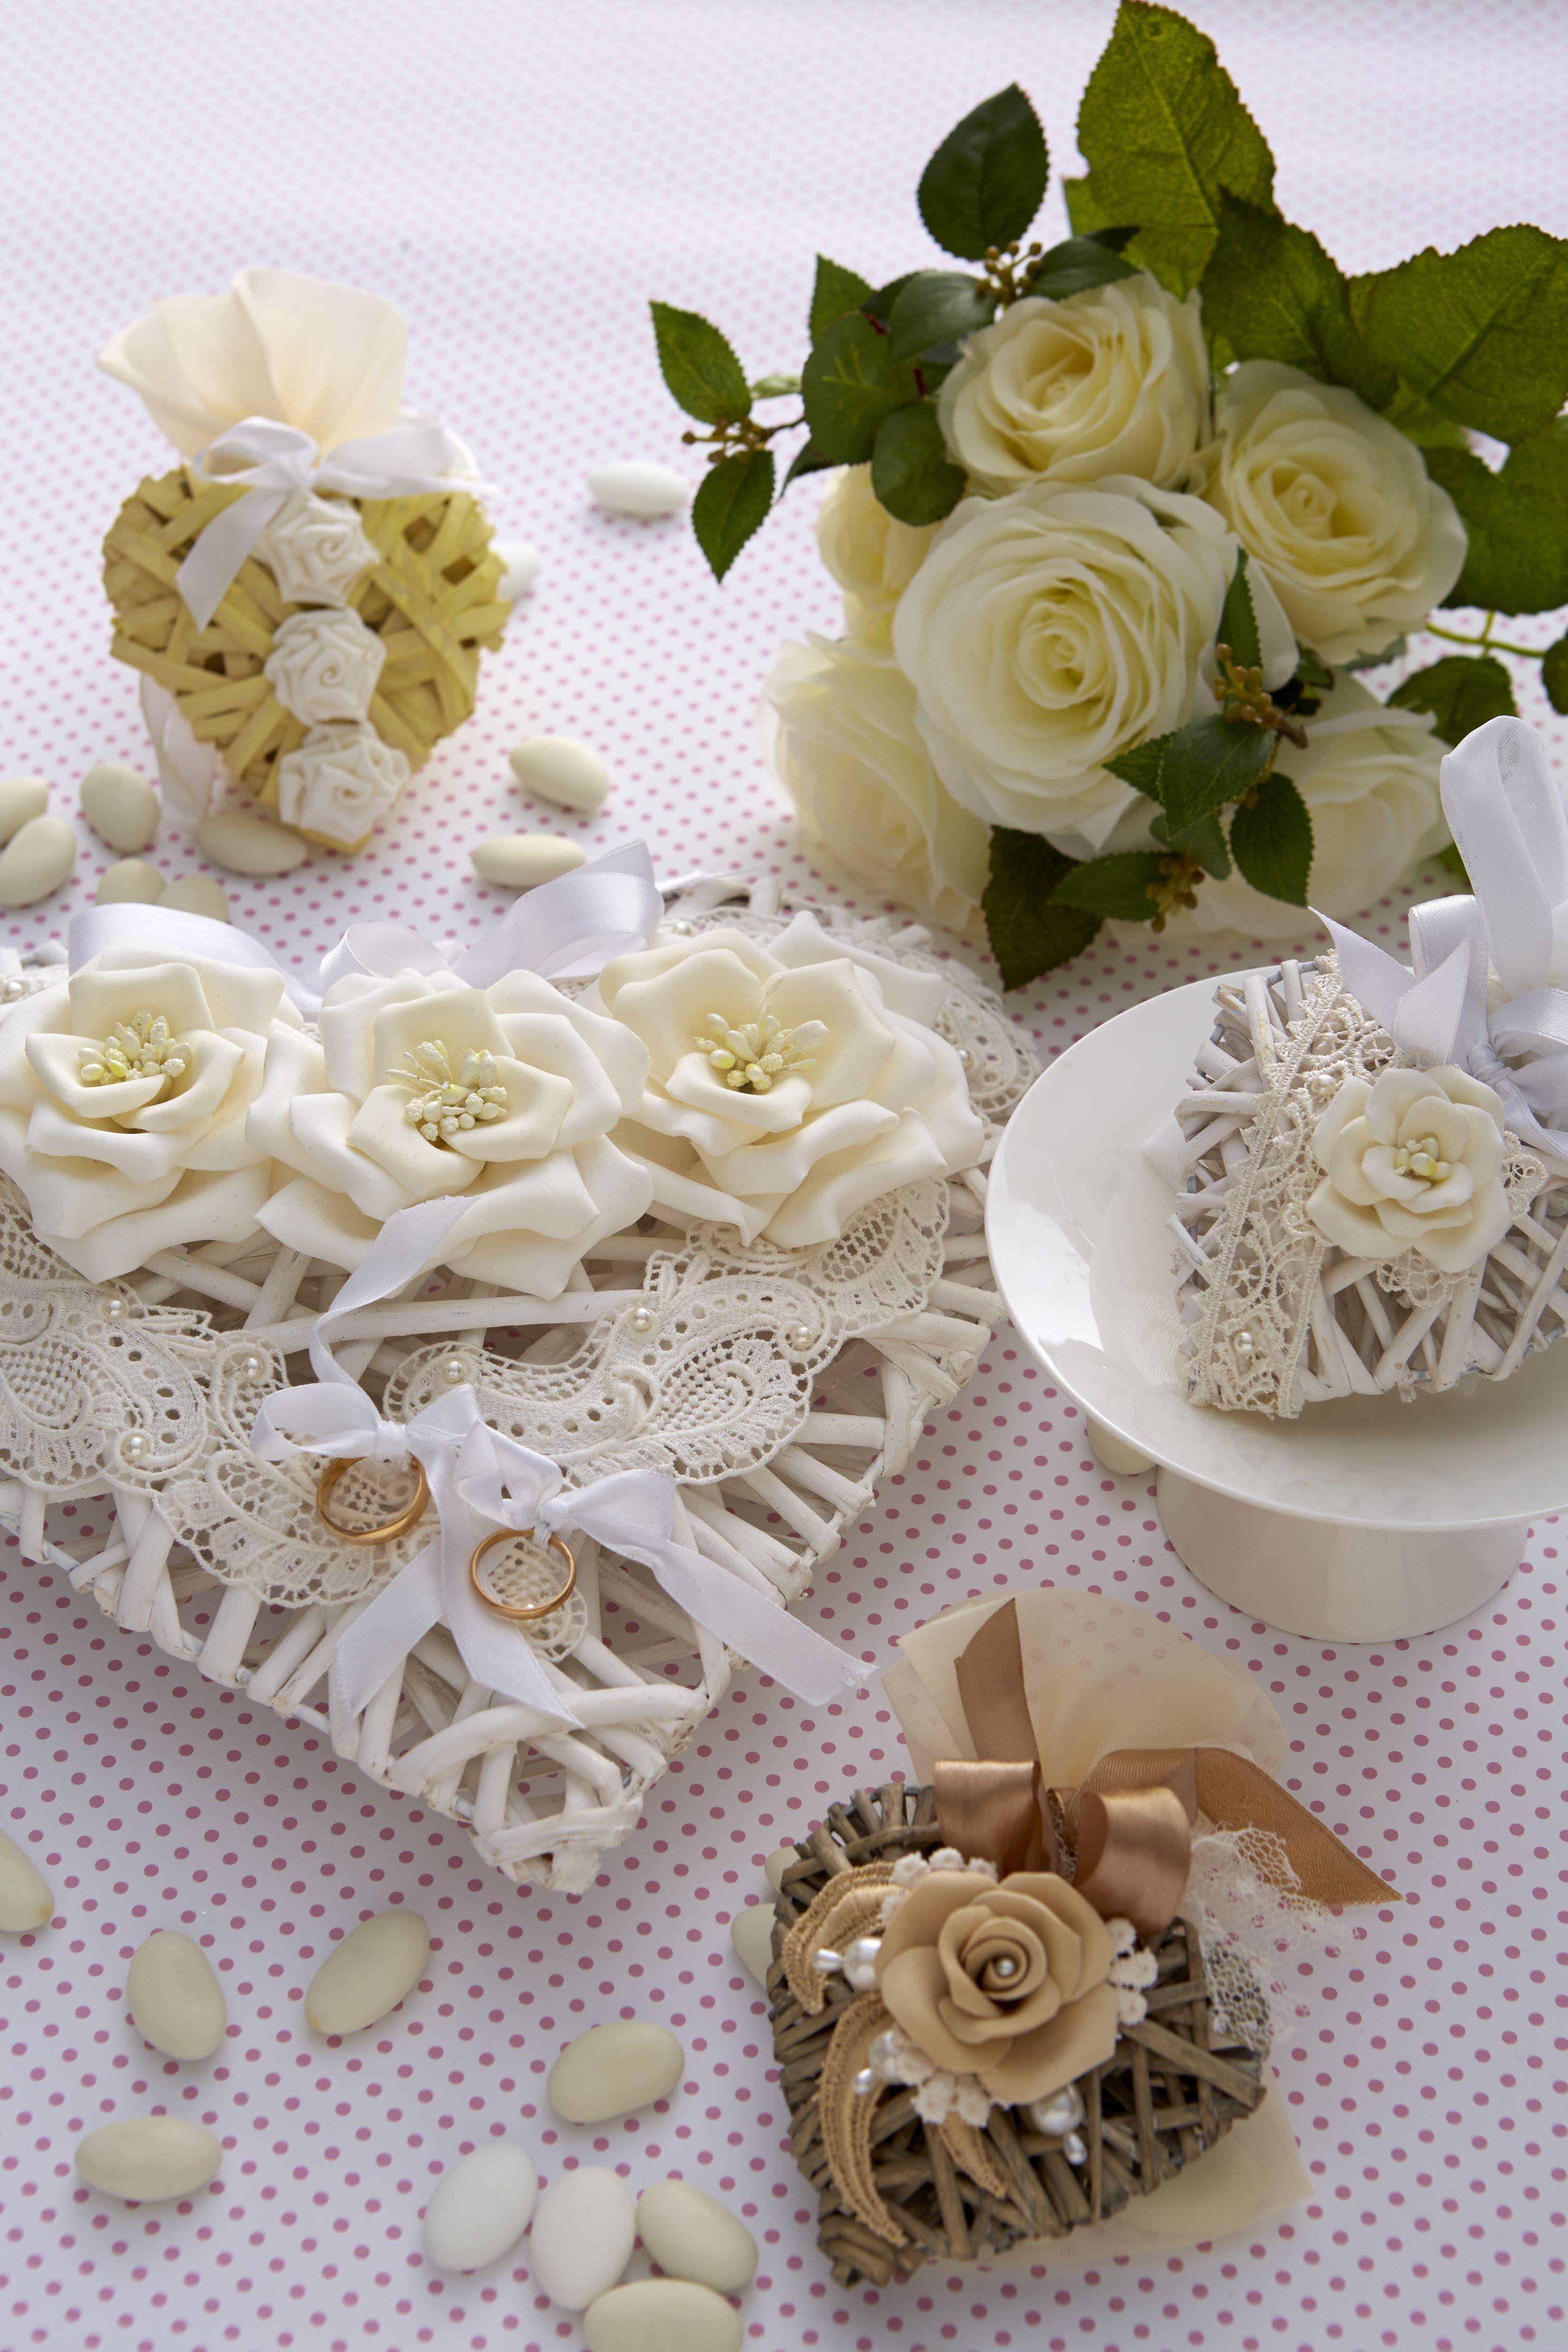 Cuscino Portafedi Nozze D Argento.Cuore Porta Fedi E Bomboniere Wedding Stuff Nozze D Argento